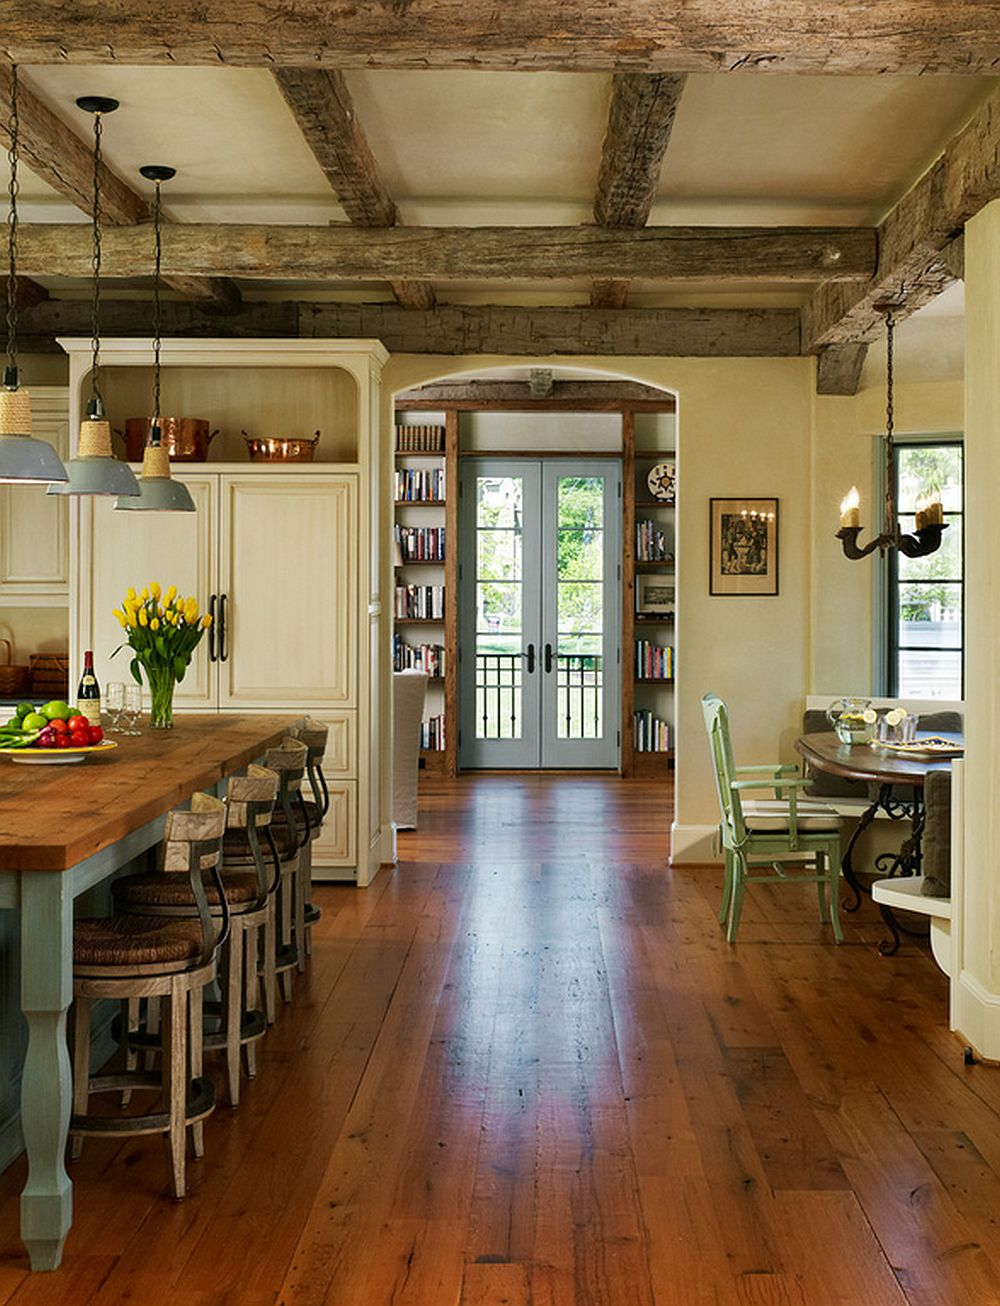 adelaparvu.com despre casa in stil rustic francez, proiect Barnes Vanze Architects, Foto Anice Hoachlander  (9)